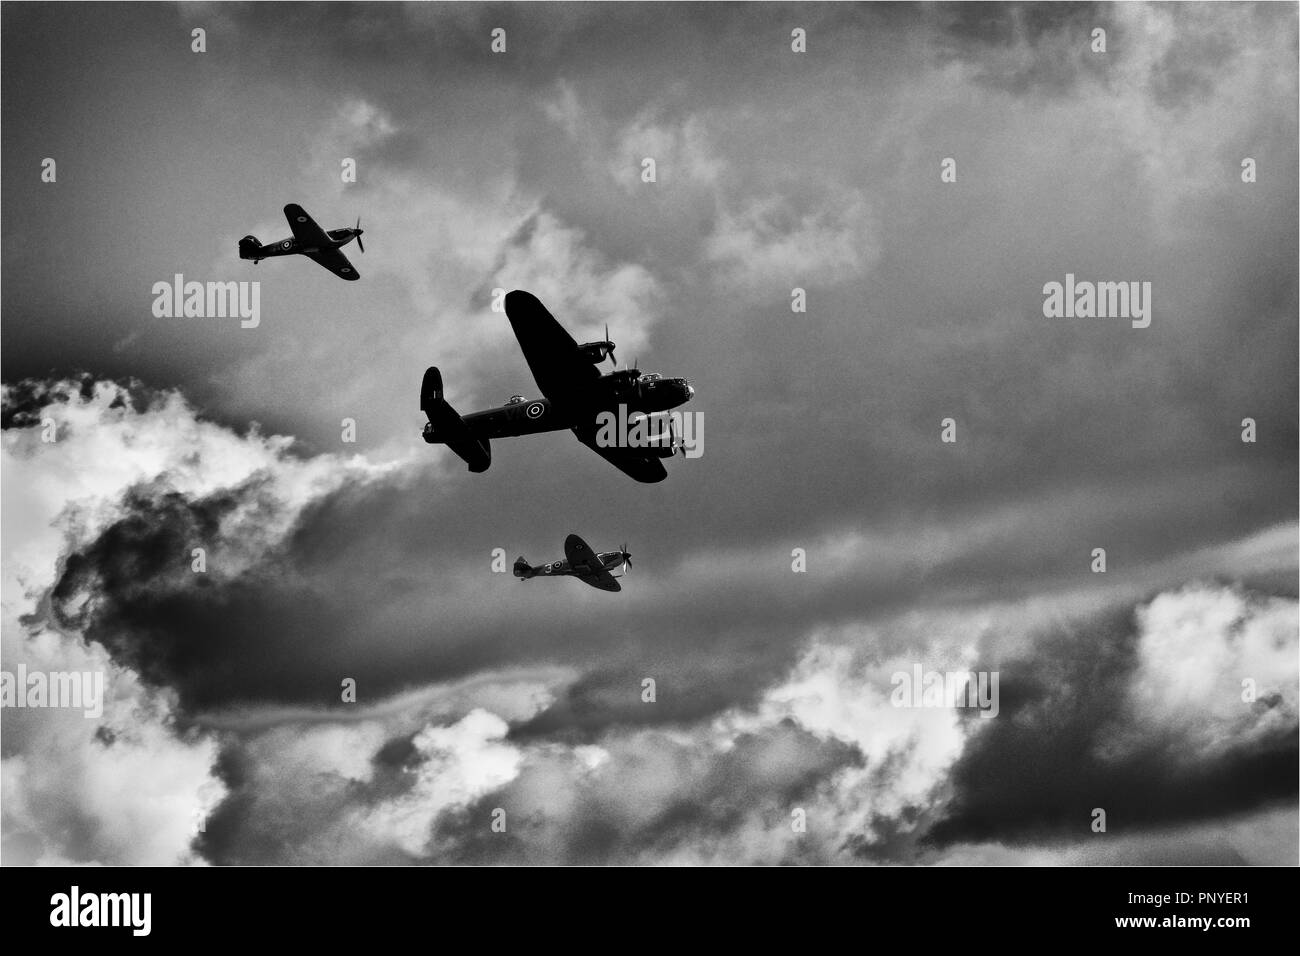 RAF Air Display - 100th Anniversary Stock Photo